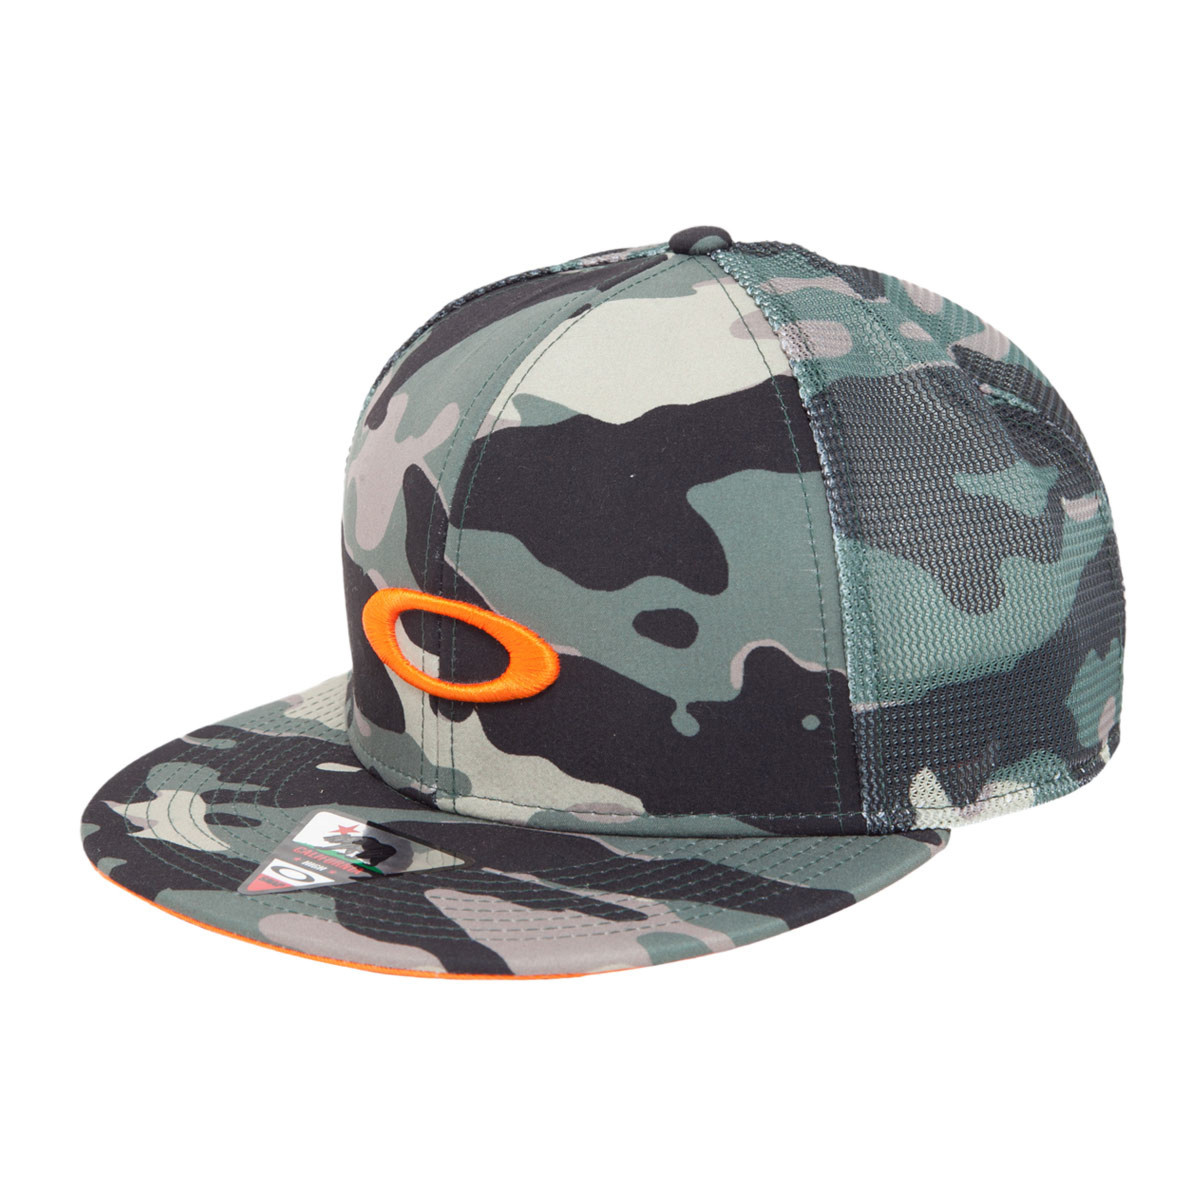 Boné Oakley Mash Sublimated Hat Camuflado ref 911511-799 aa8e46b6fc